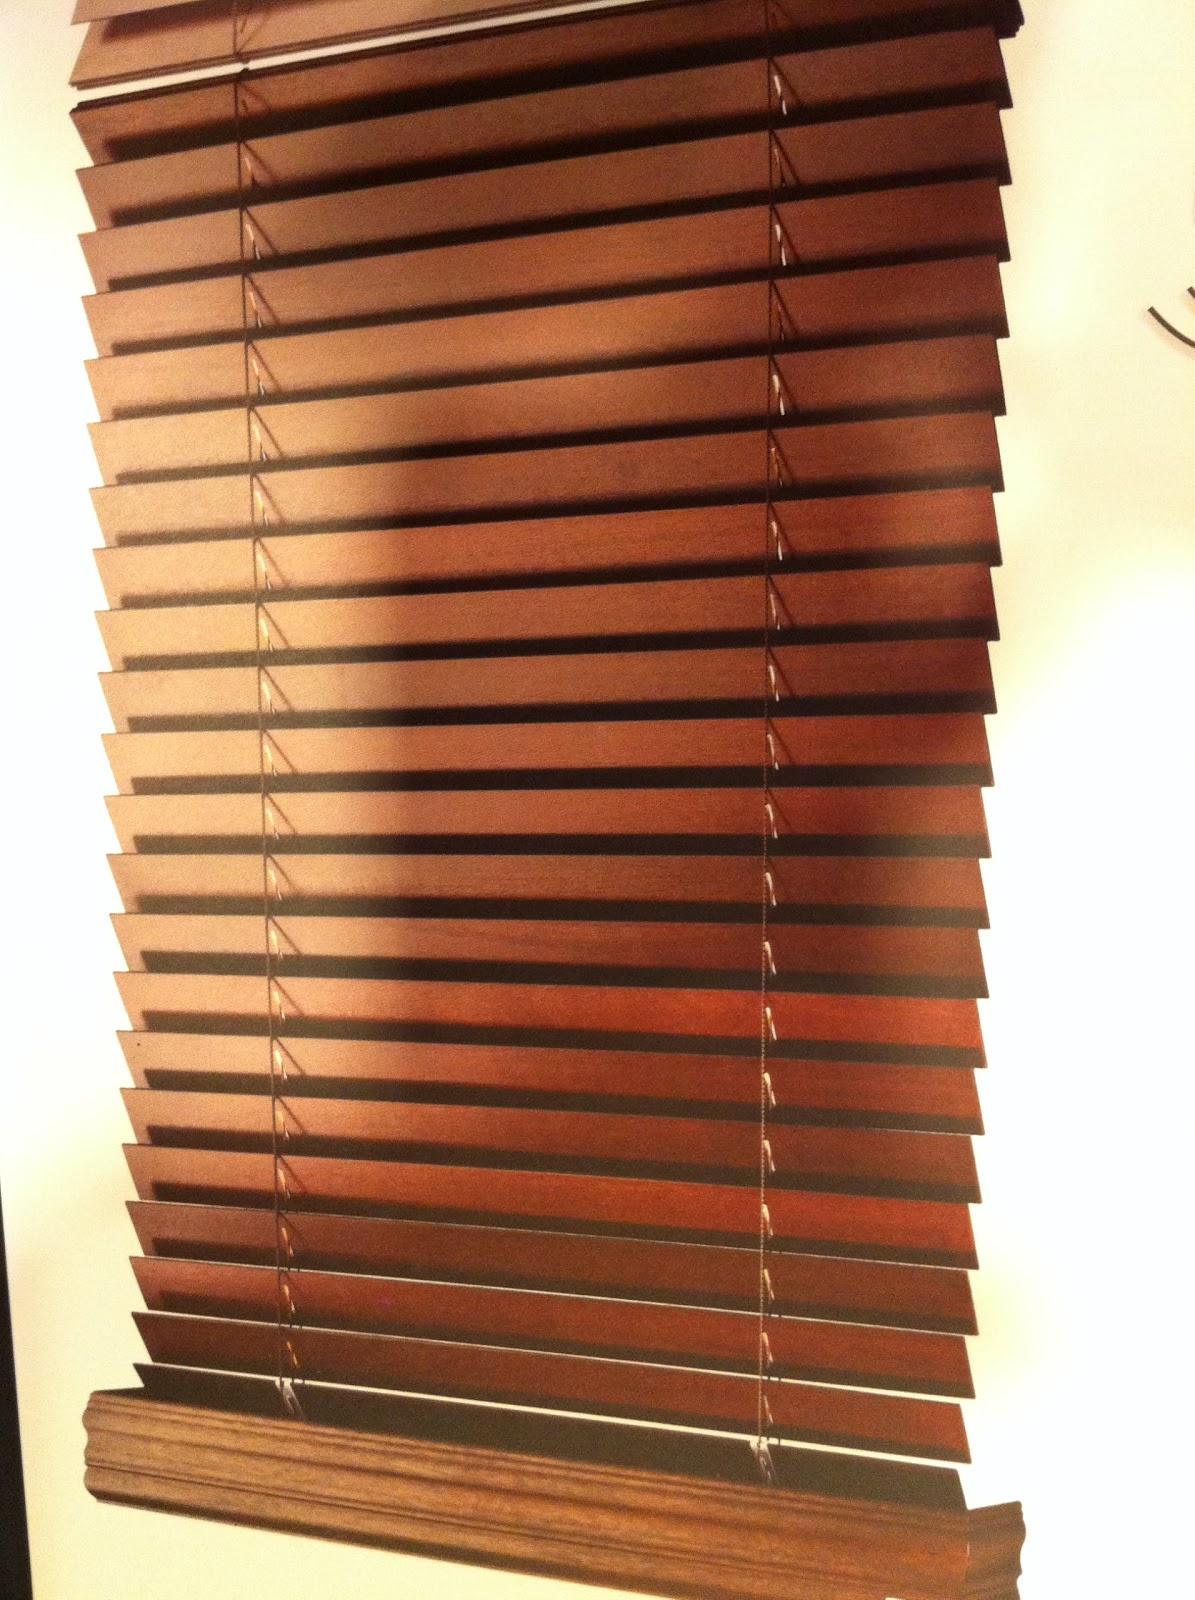 Ihomefurnishing: Best quality wooden venetian Blinds